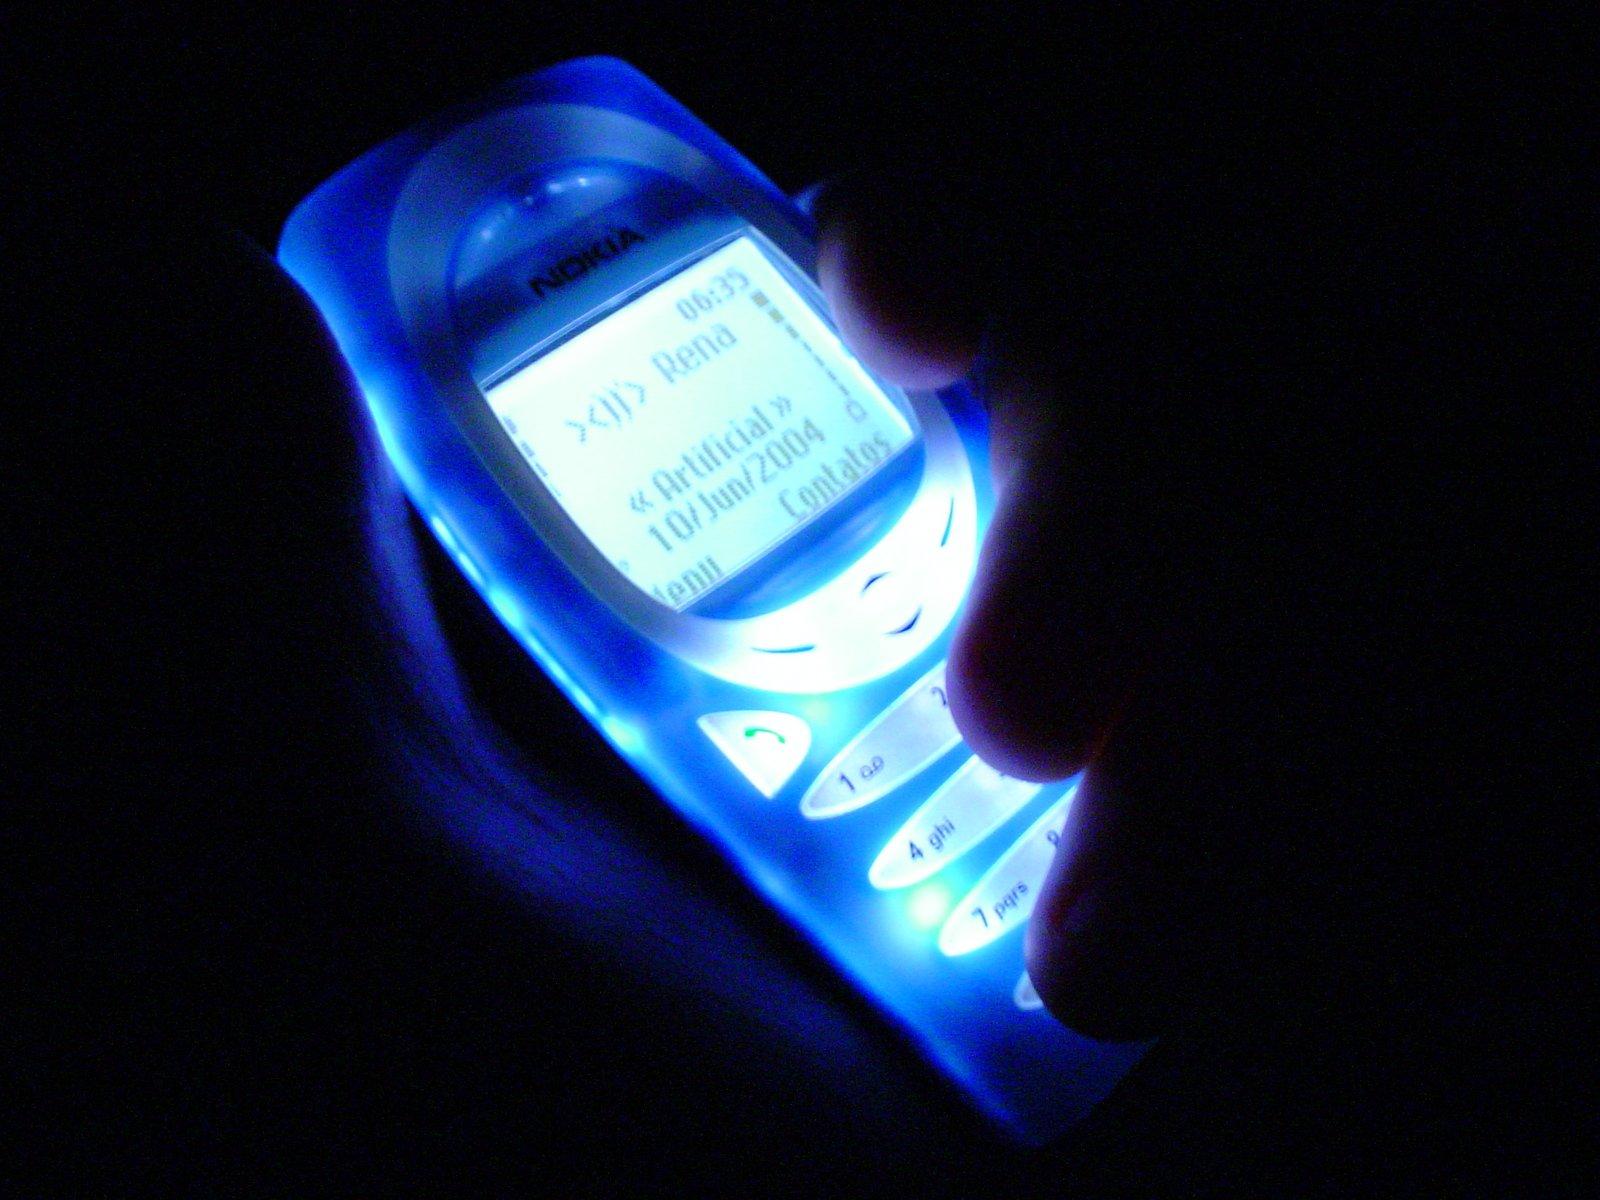 Nokia light